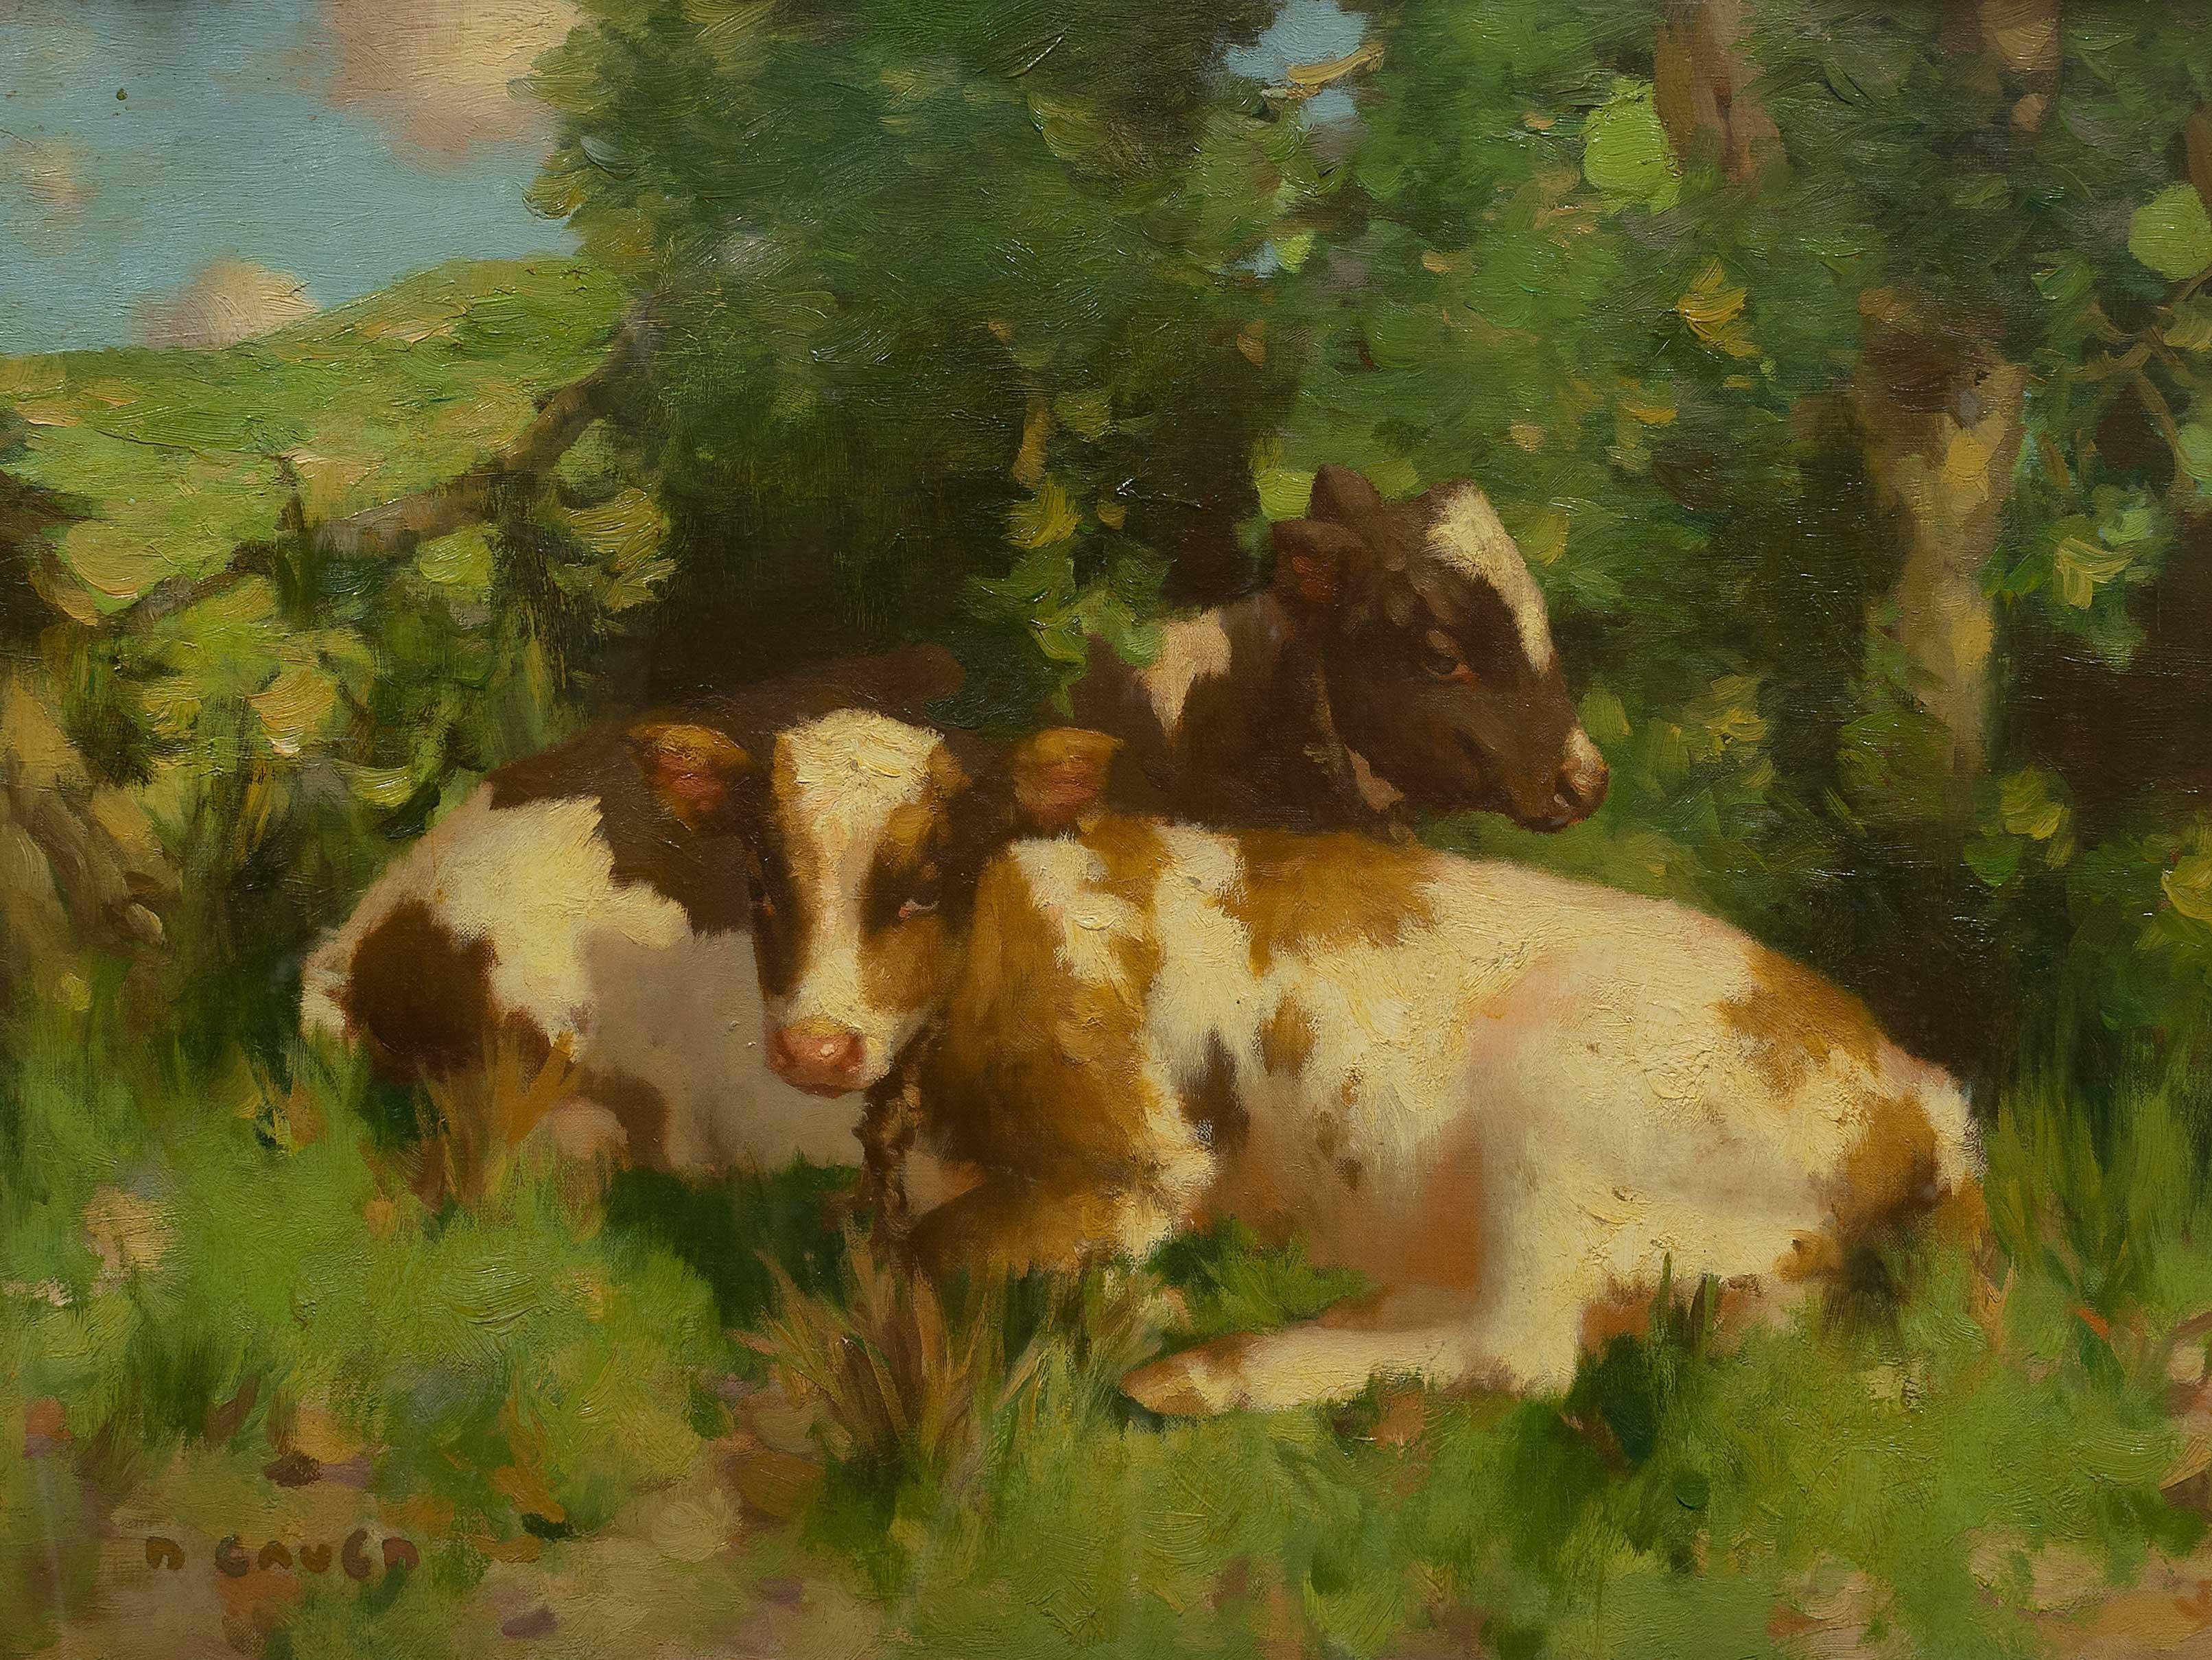 David Gauld (Scottish 1865 - 1936) Oil, Cattle, Signed, 50 x 75